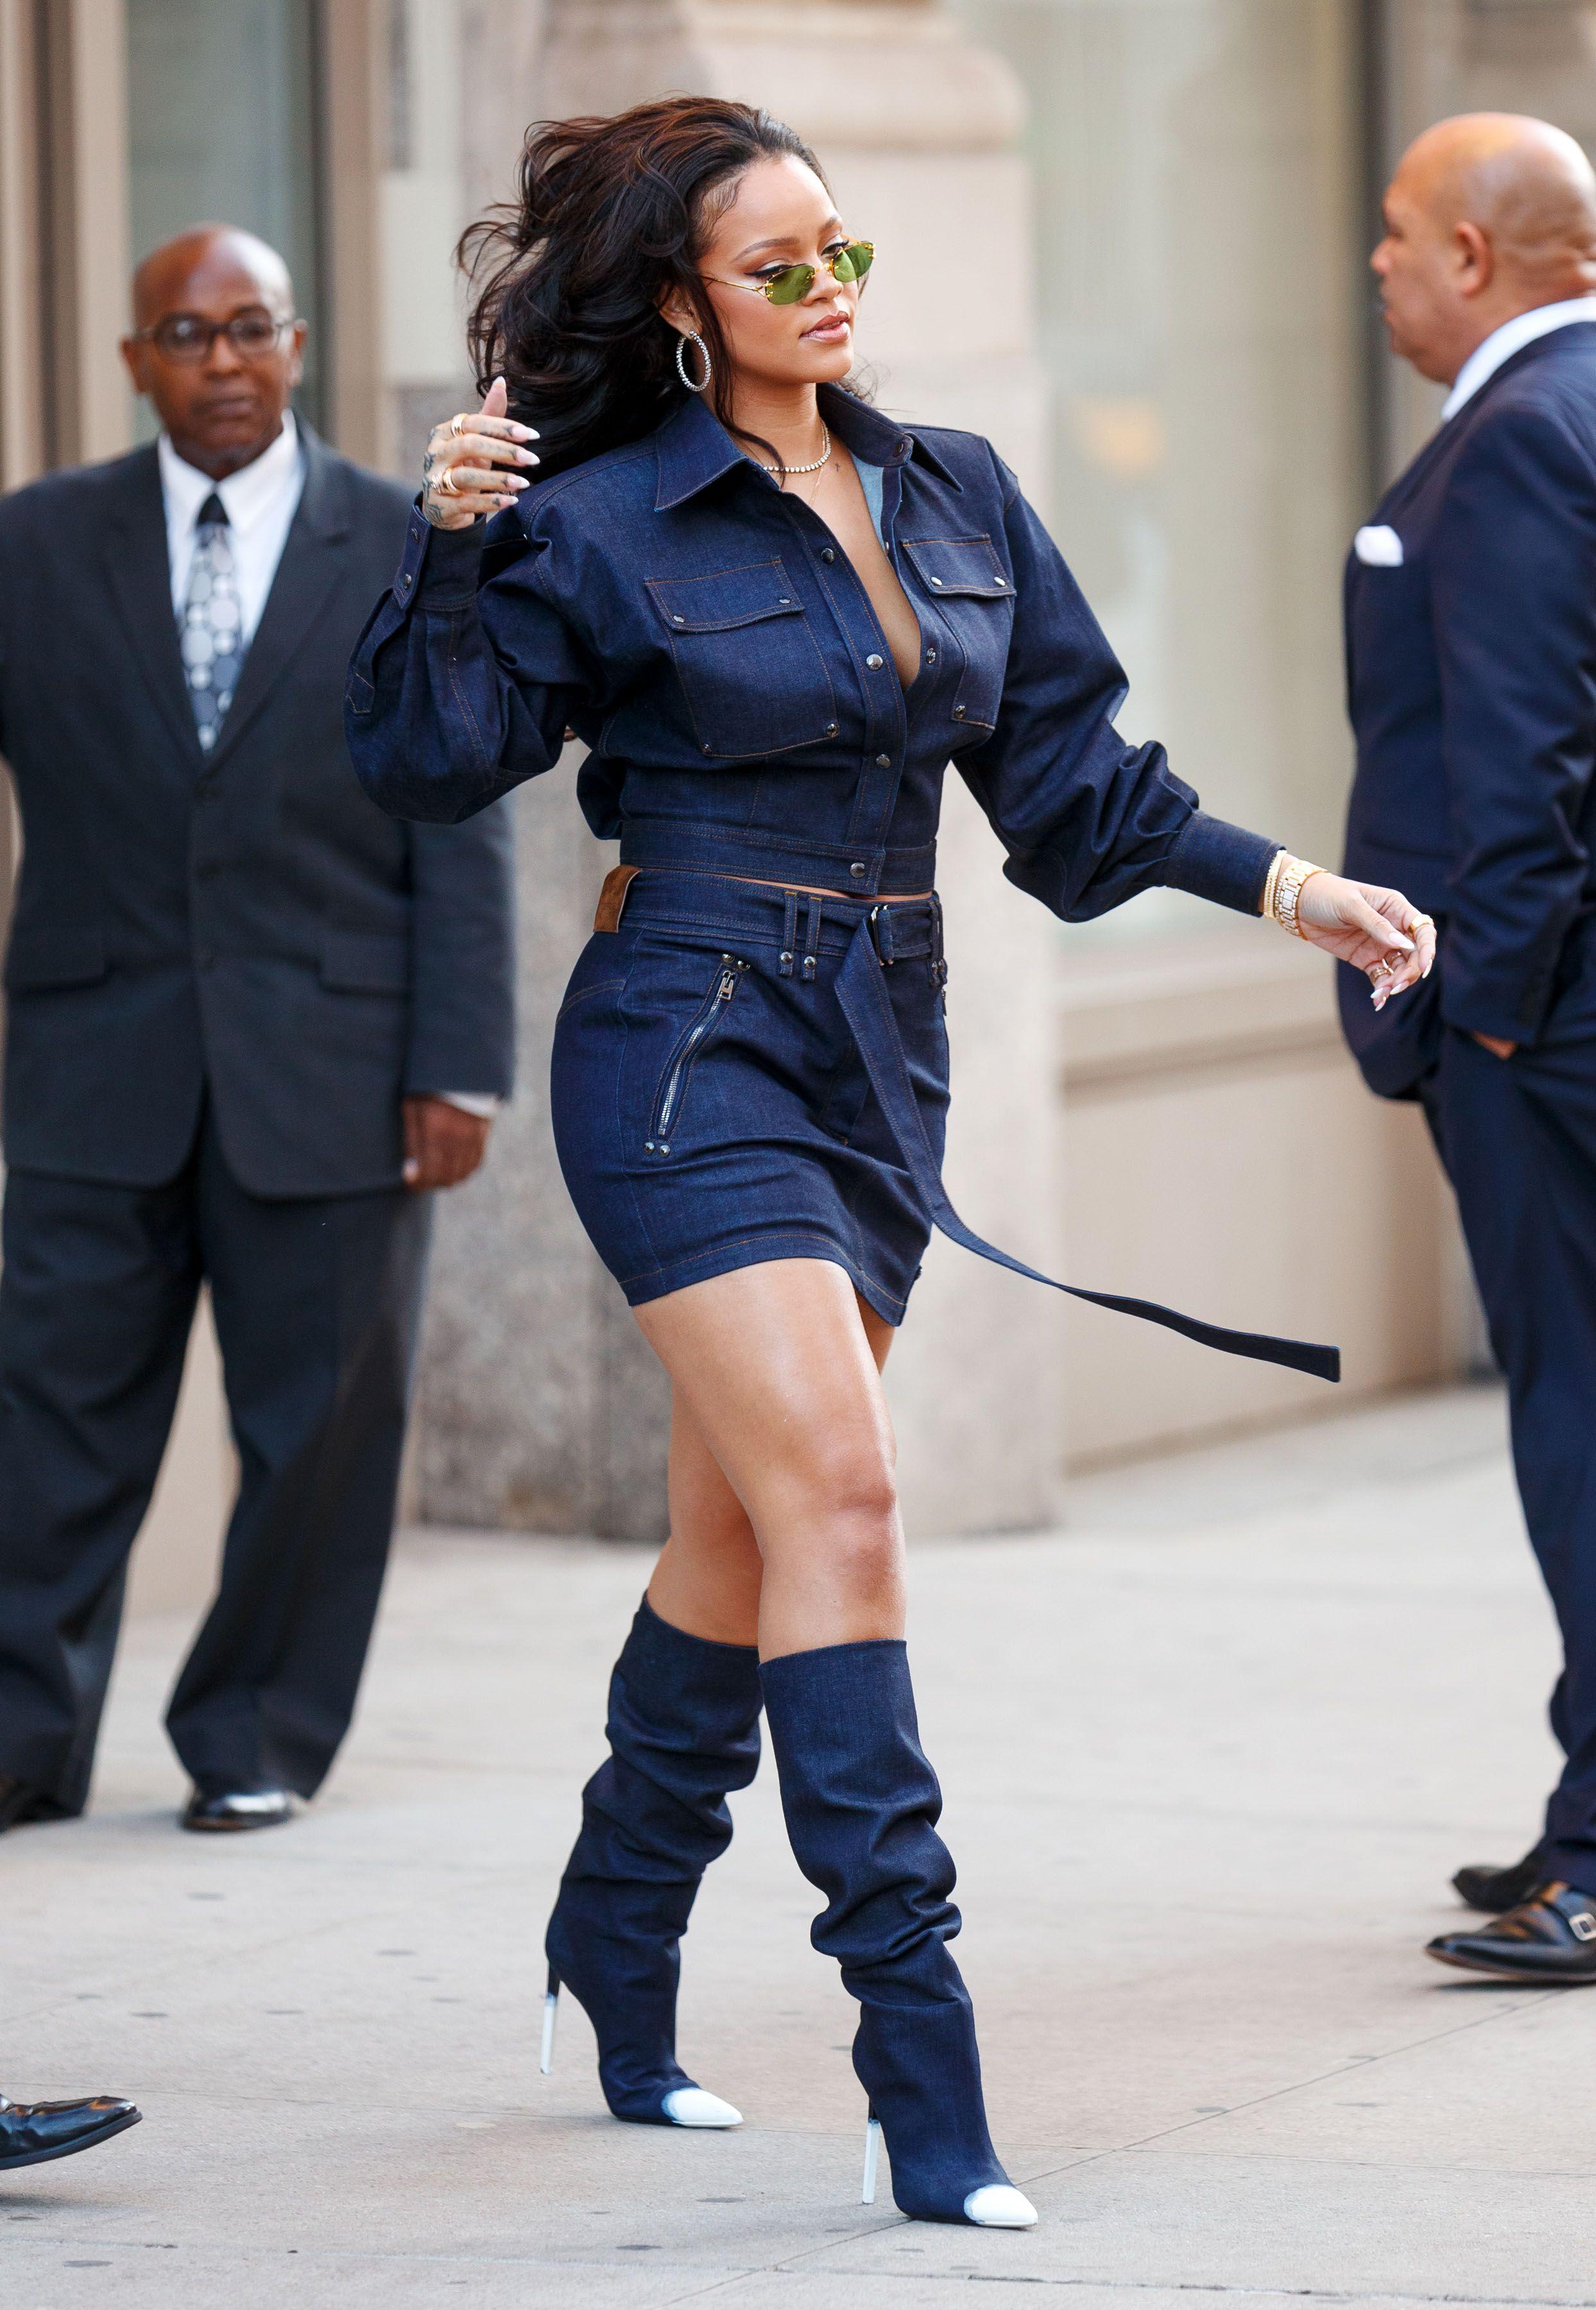 Thickanna 12 Photos Of Rihanna Looking Thick And Flawless